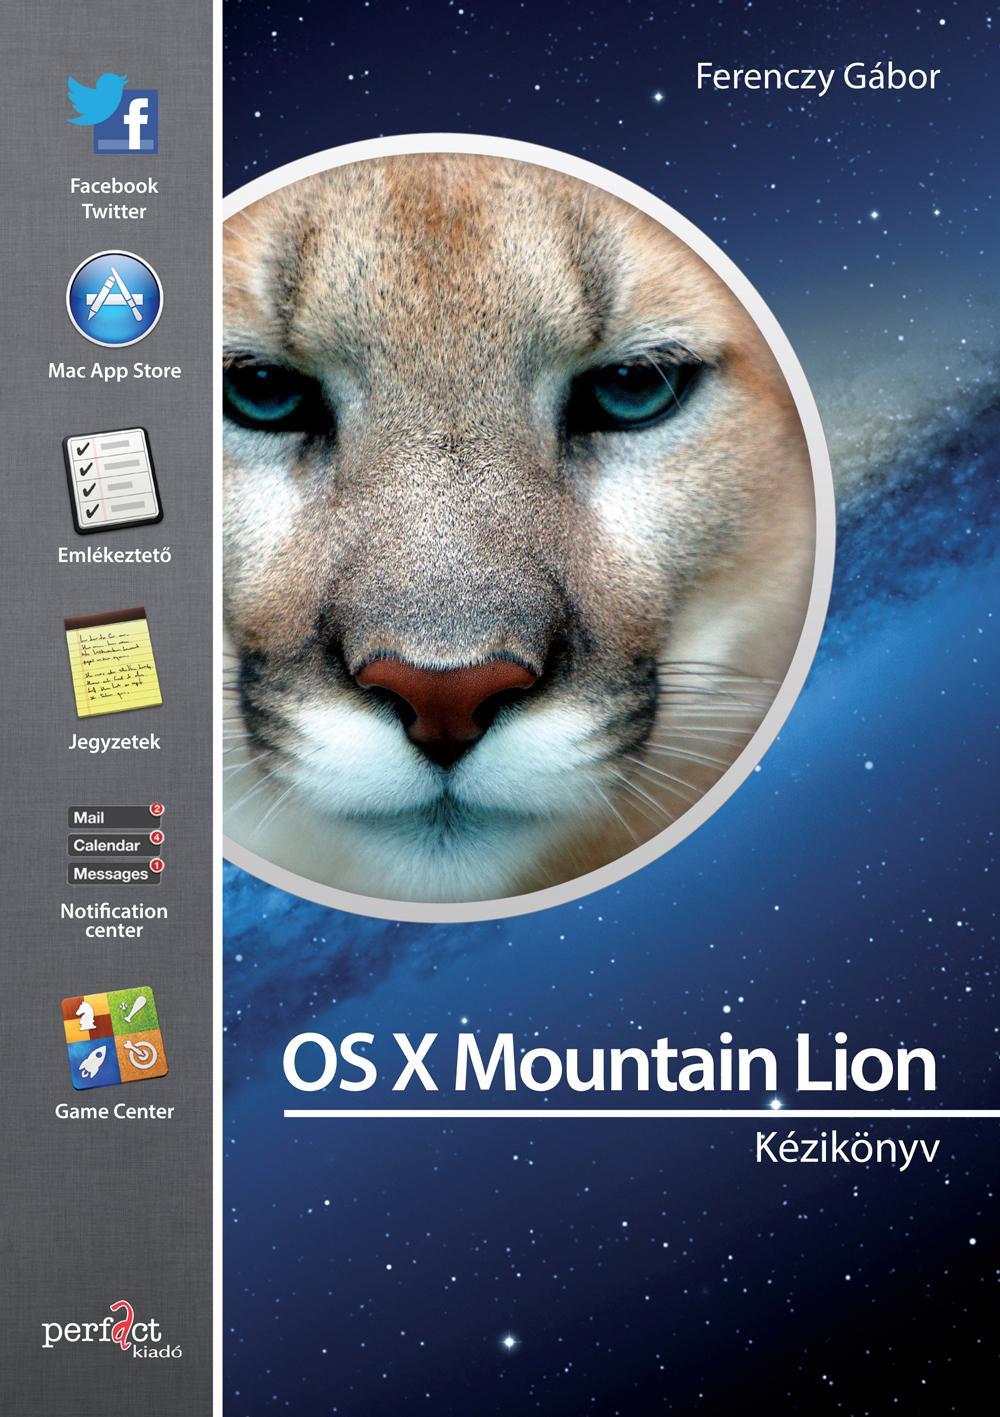 OS X MOUNTAIN LION KÉZIKÖNYV